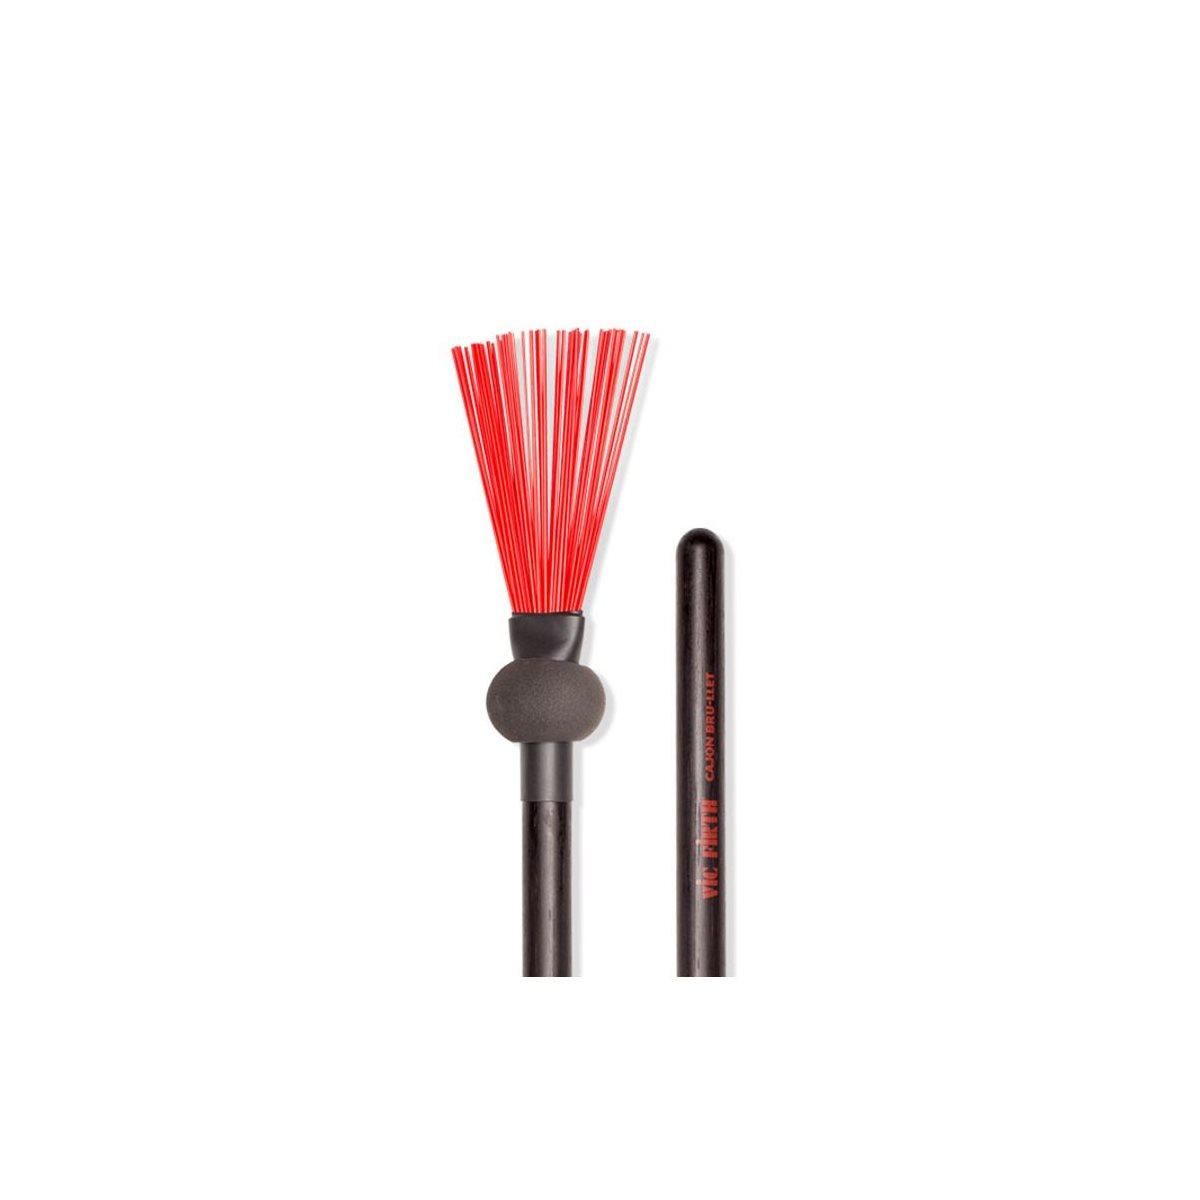 VIC FIRTH - CB1 - CAJON BRU-LLET - brush / mallet